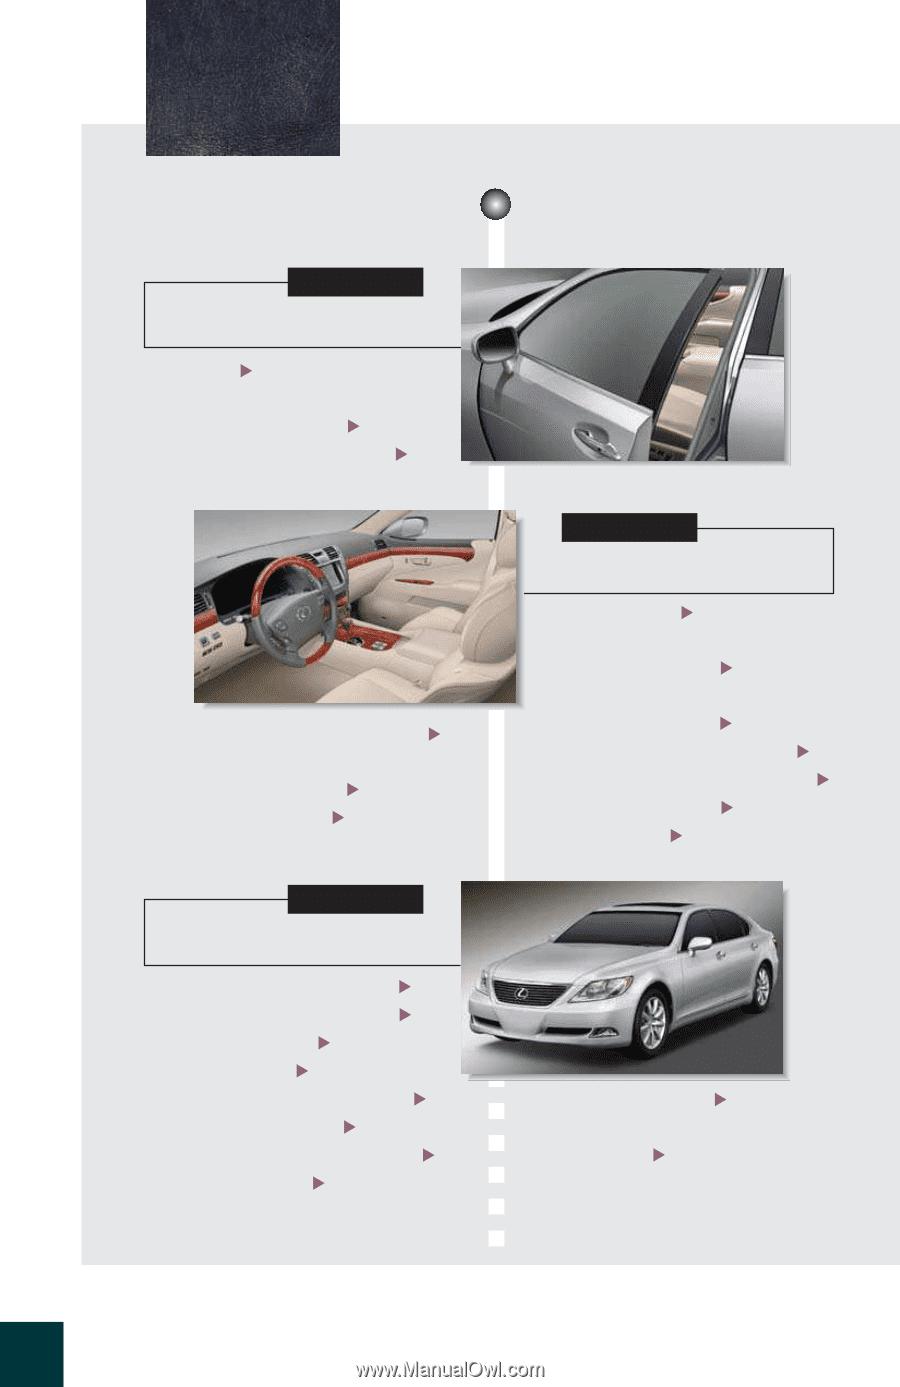 2011 Lexus LS 460 L LS 460 Wiring Diagrams Schematics Layout Factory OEM